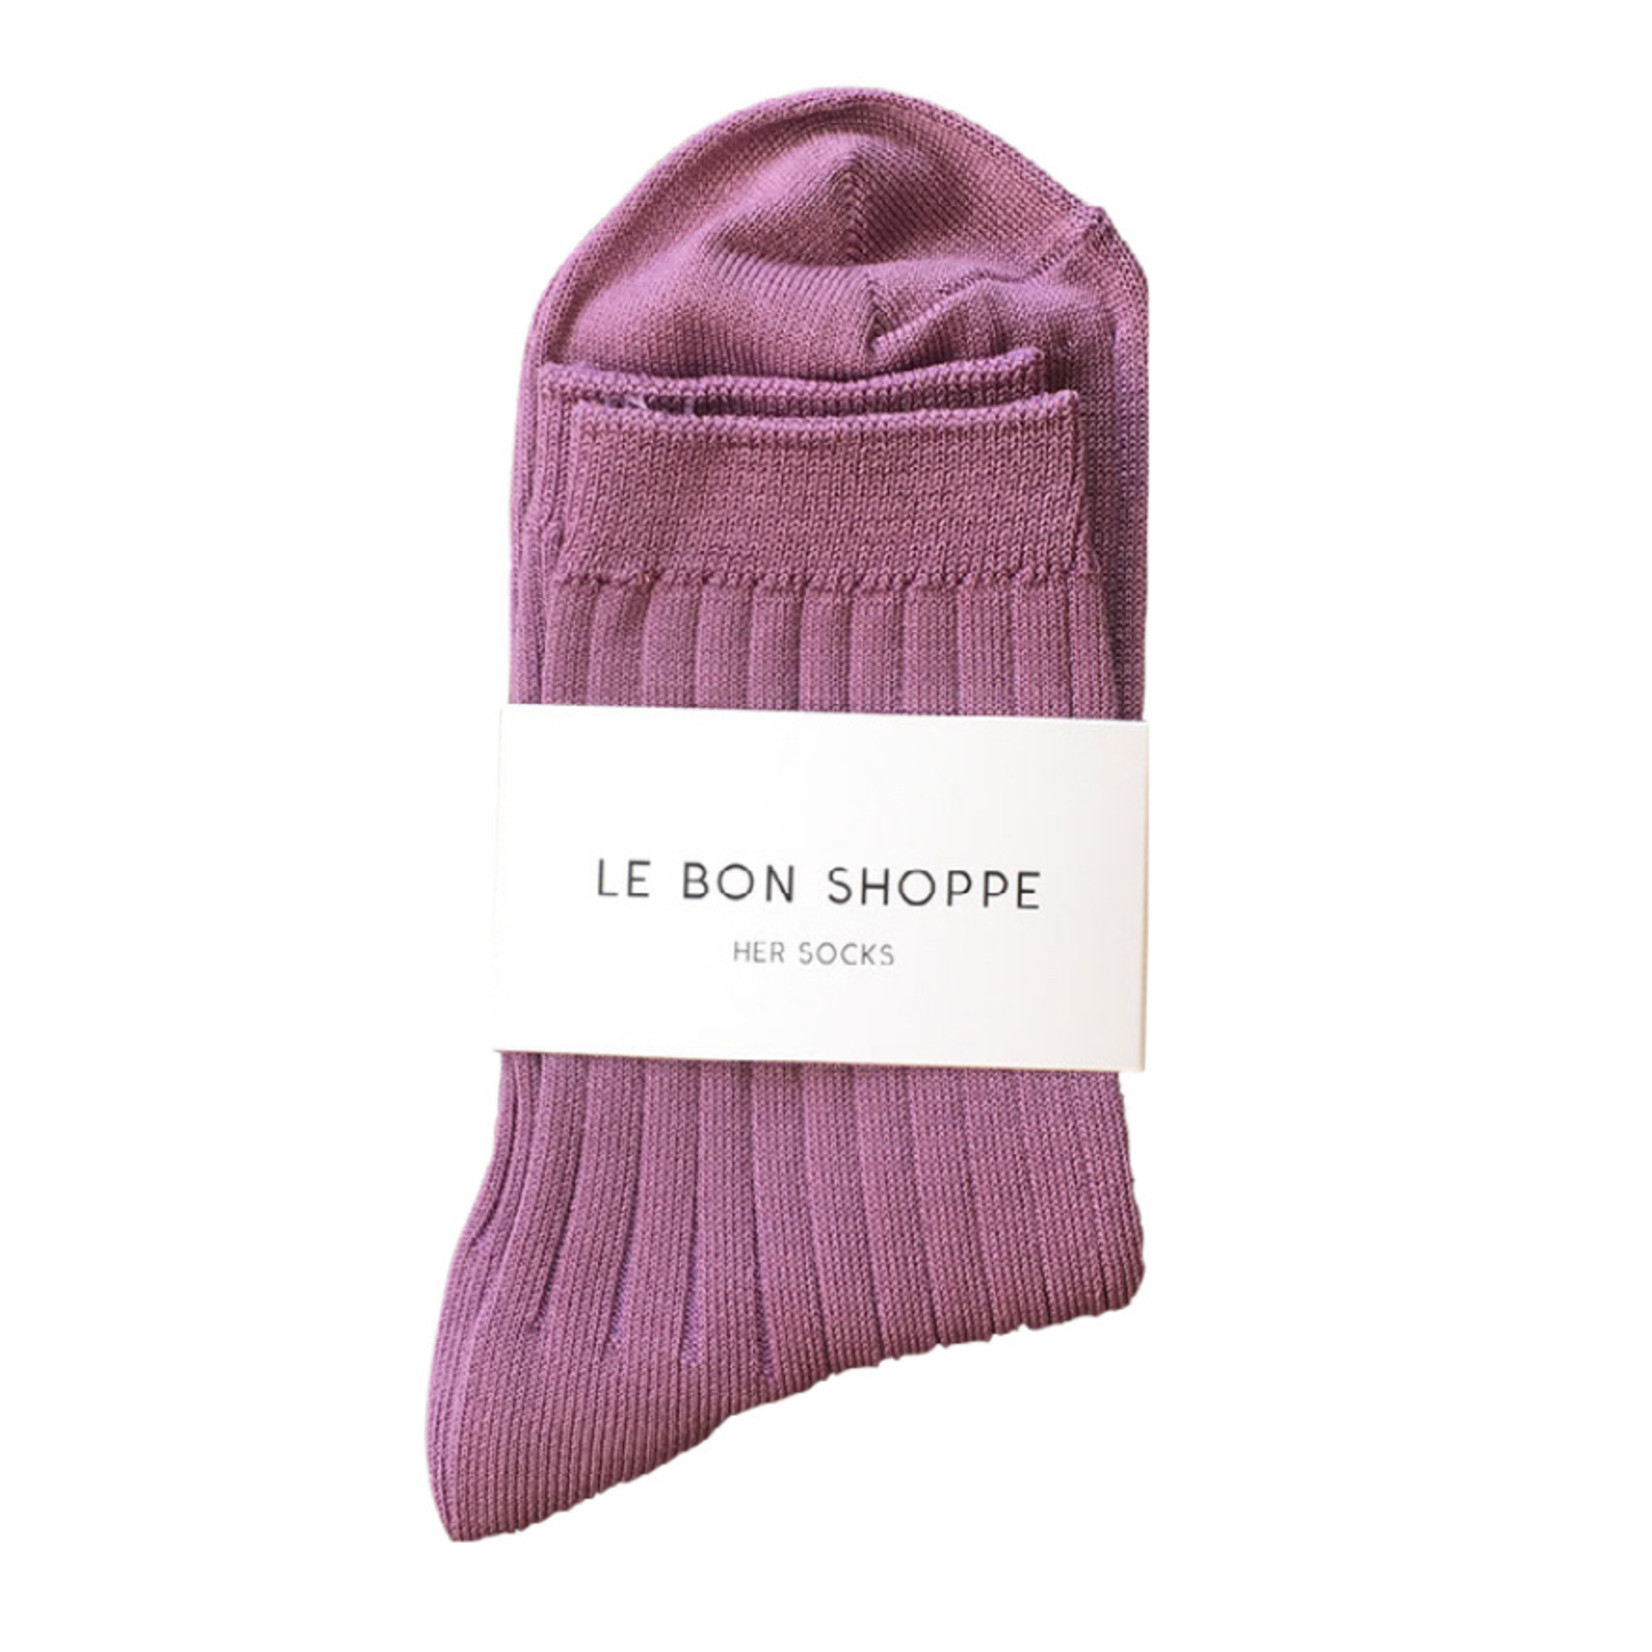 Le Bon Shoppe Her Socks Orchid